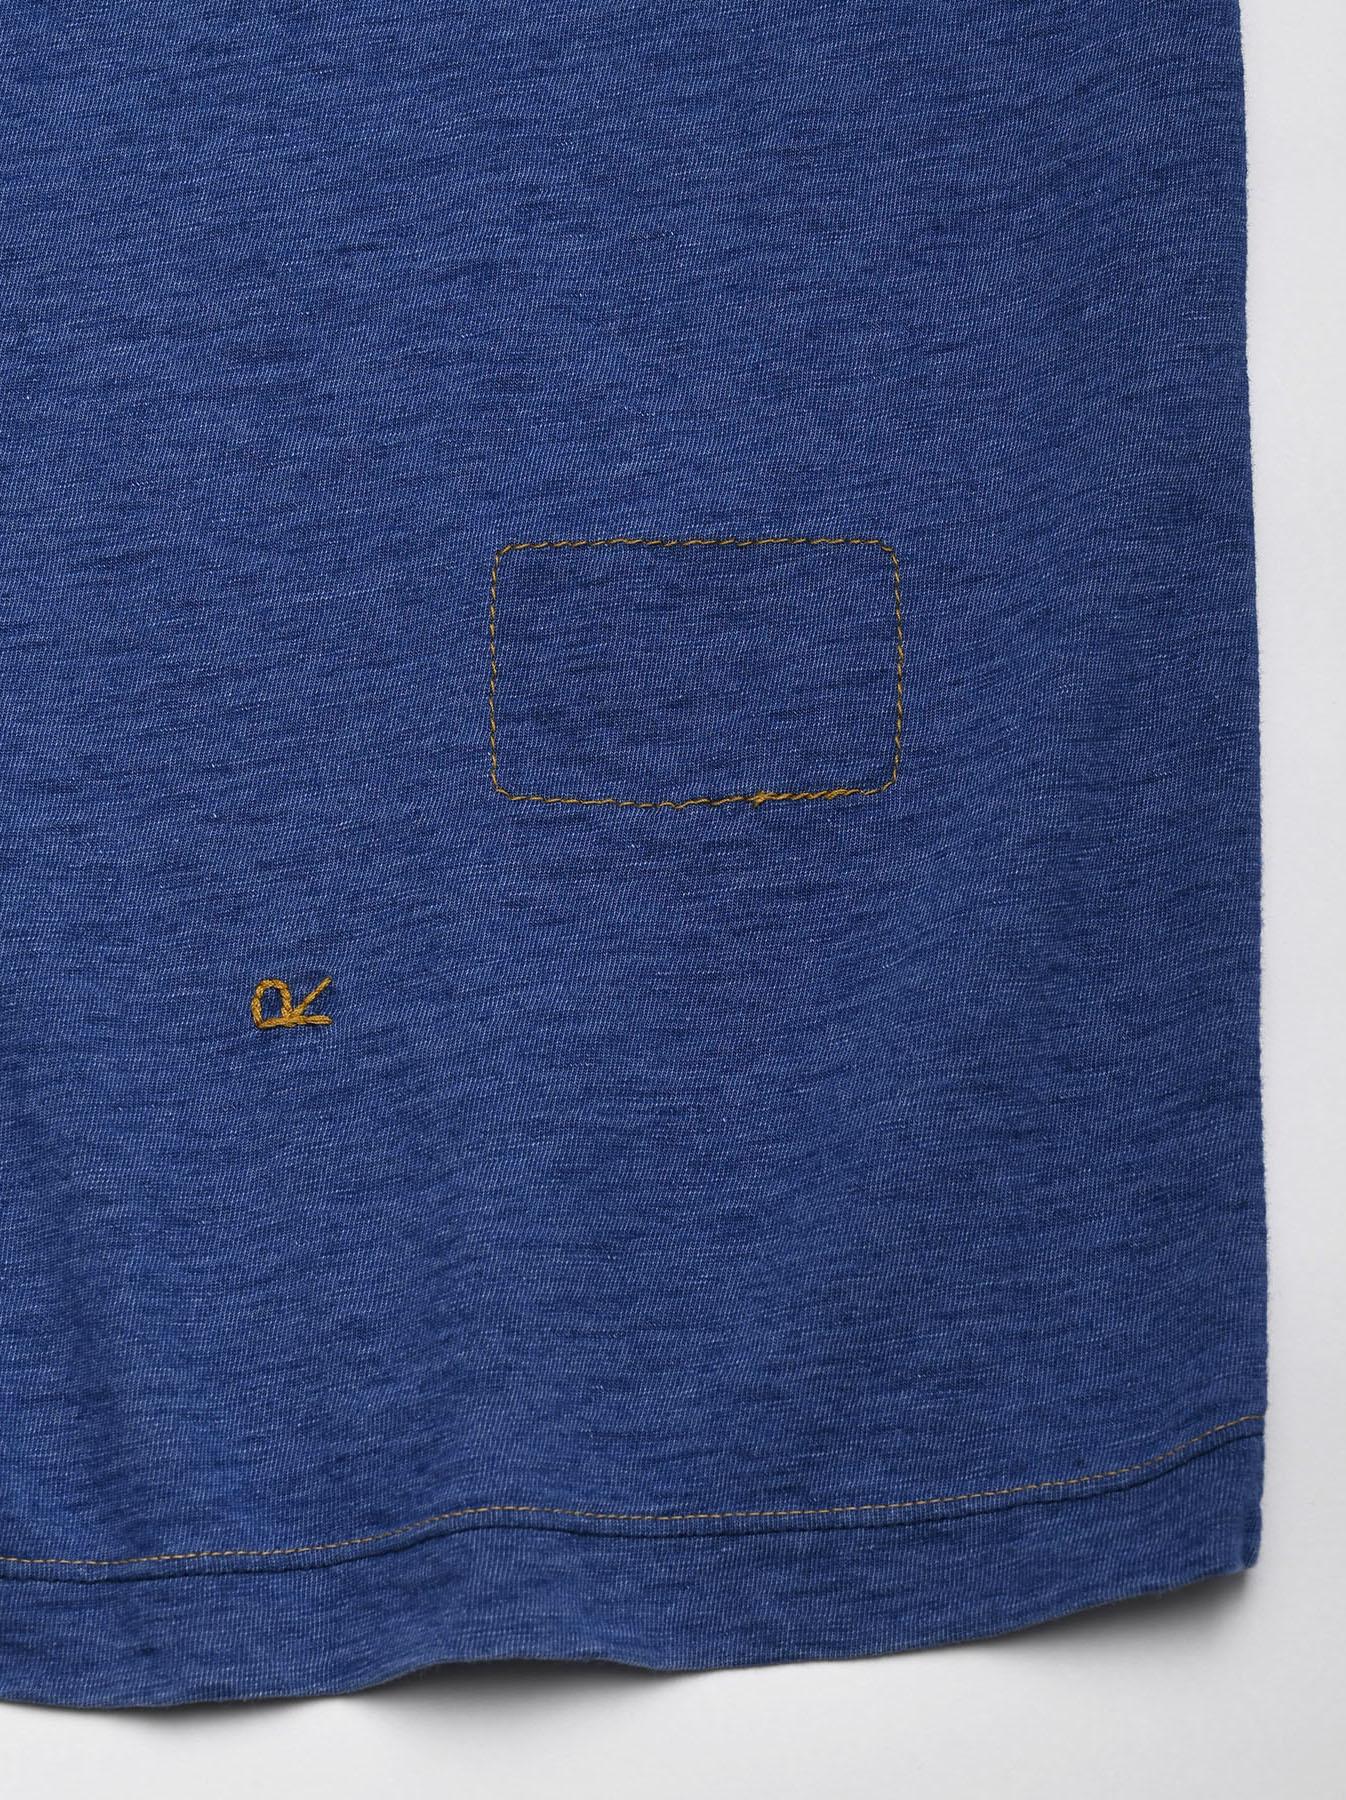 Distressed Indigo Tenjiku 908 Ocean T-Shirt (0621)-11